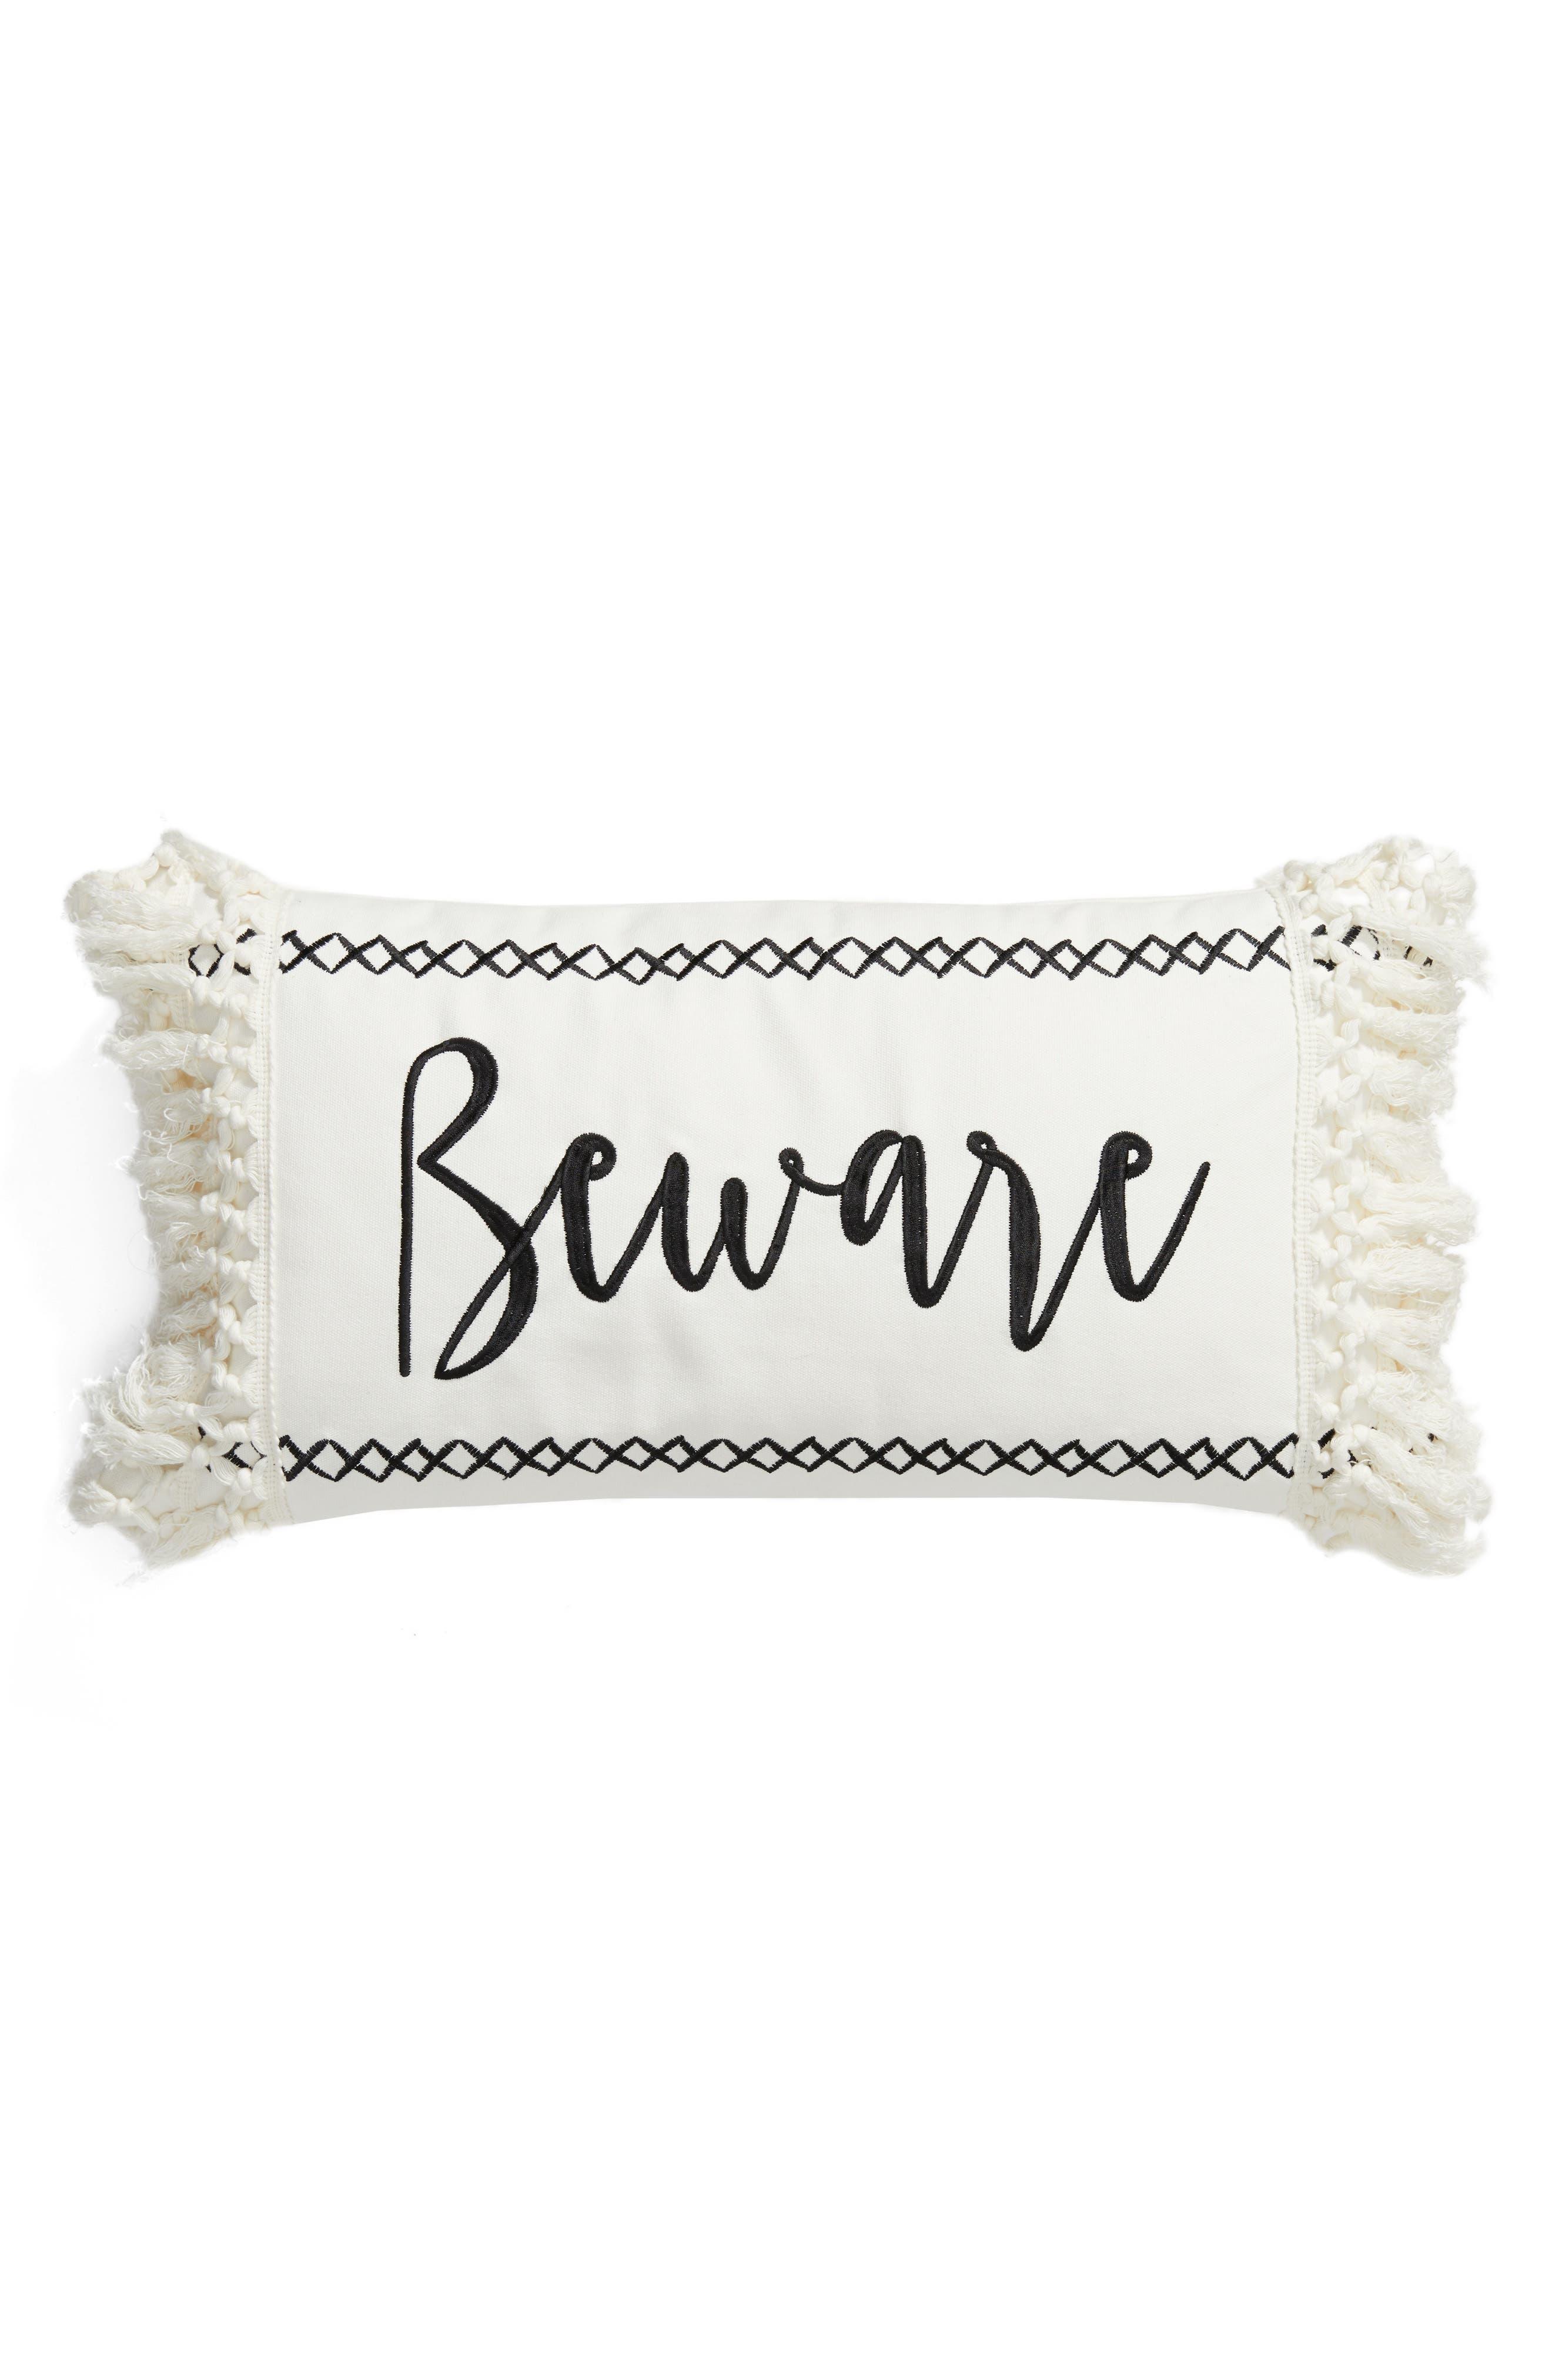 Beware Accent Pillow,                         Main,                         color, 900